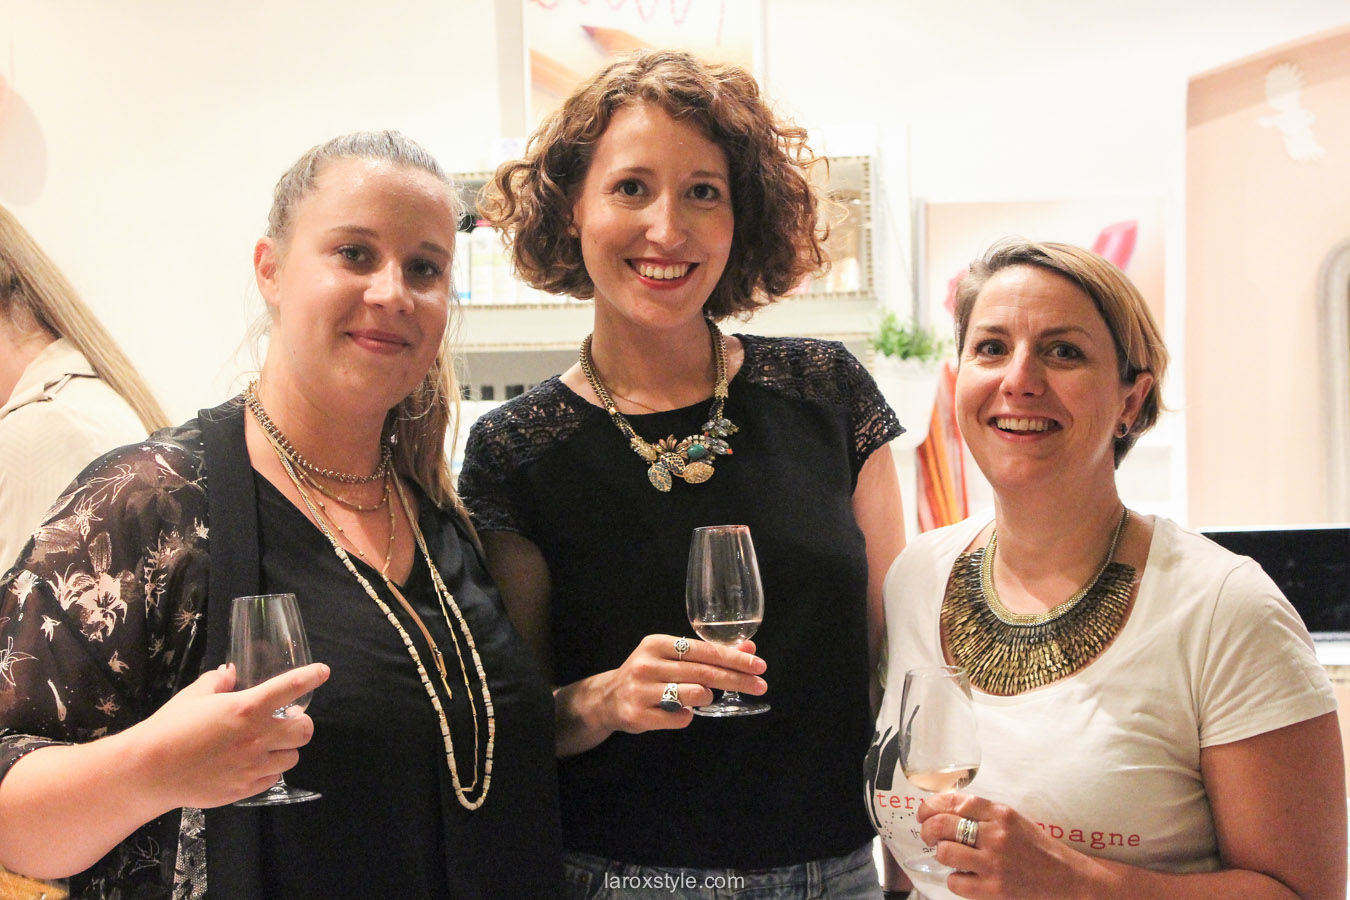 laroxstyle - blog mode lyon - apero vin et bijoux metoz (47 sur 55)